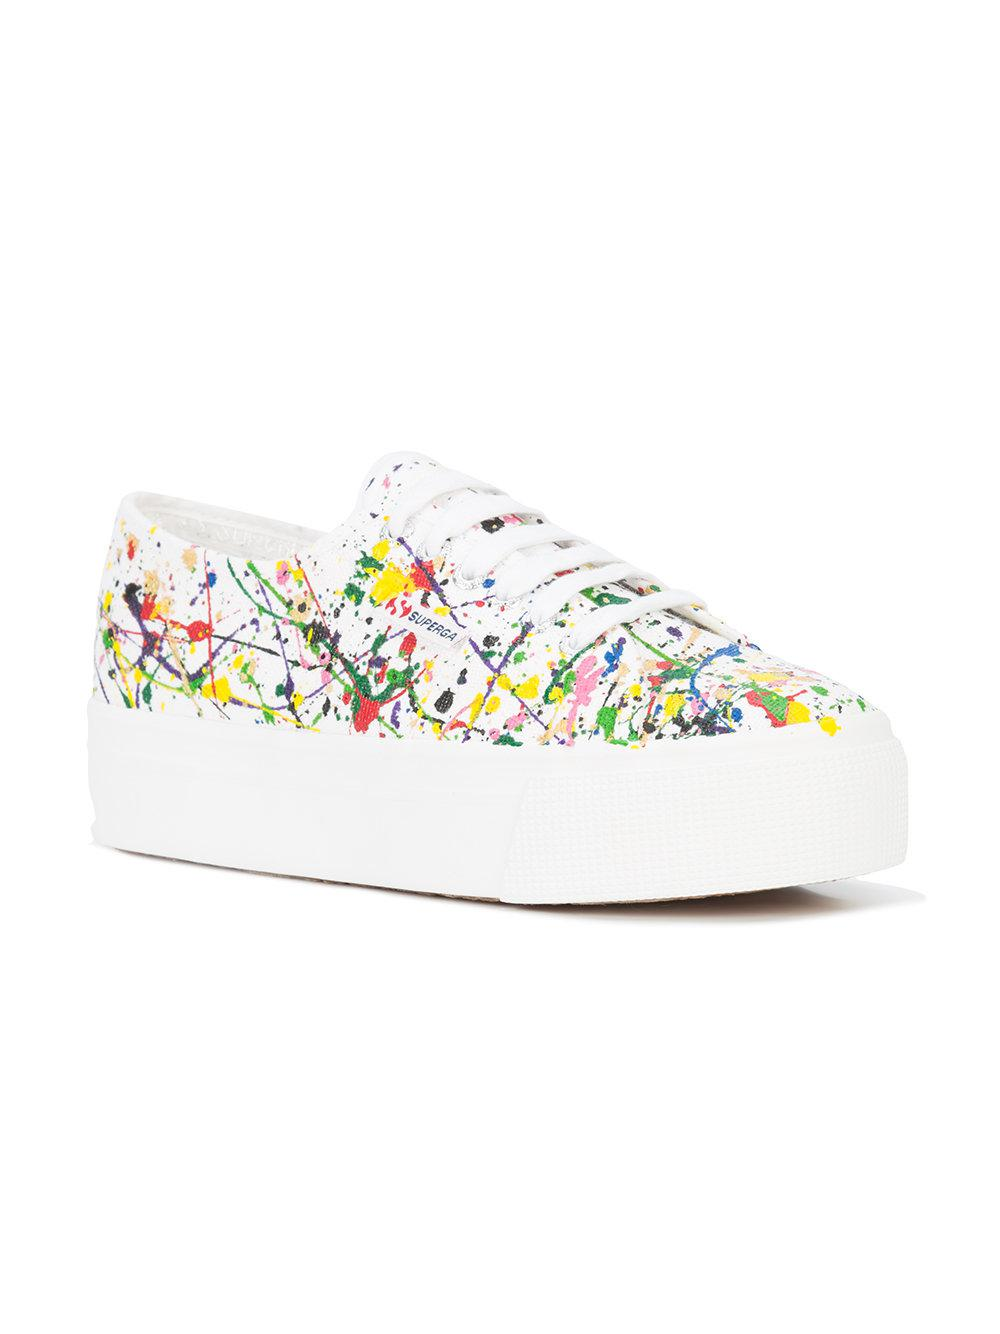 Superga Canvas Splatter Sneakers